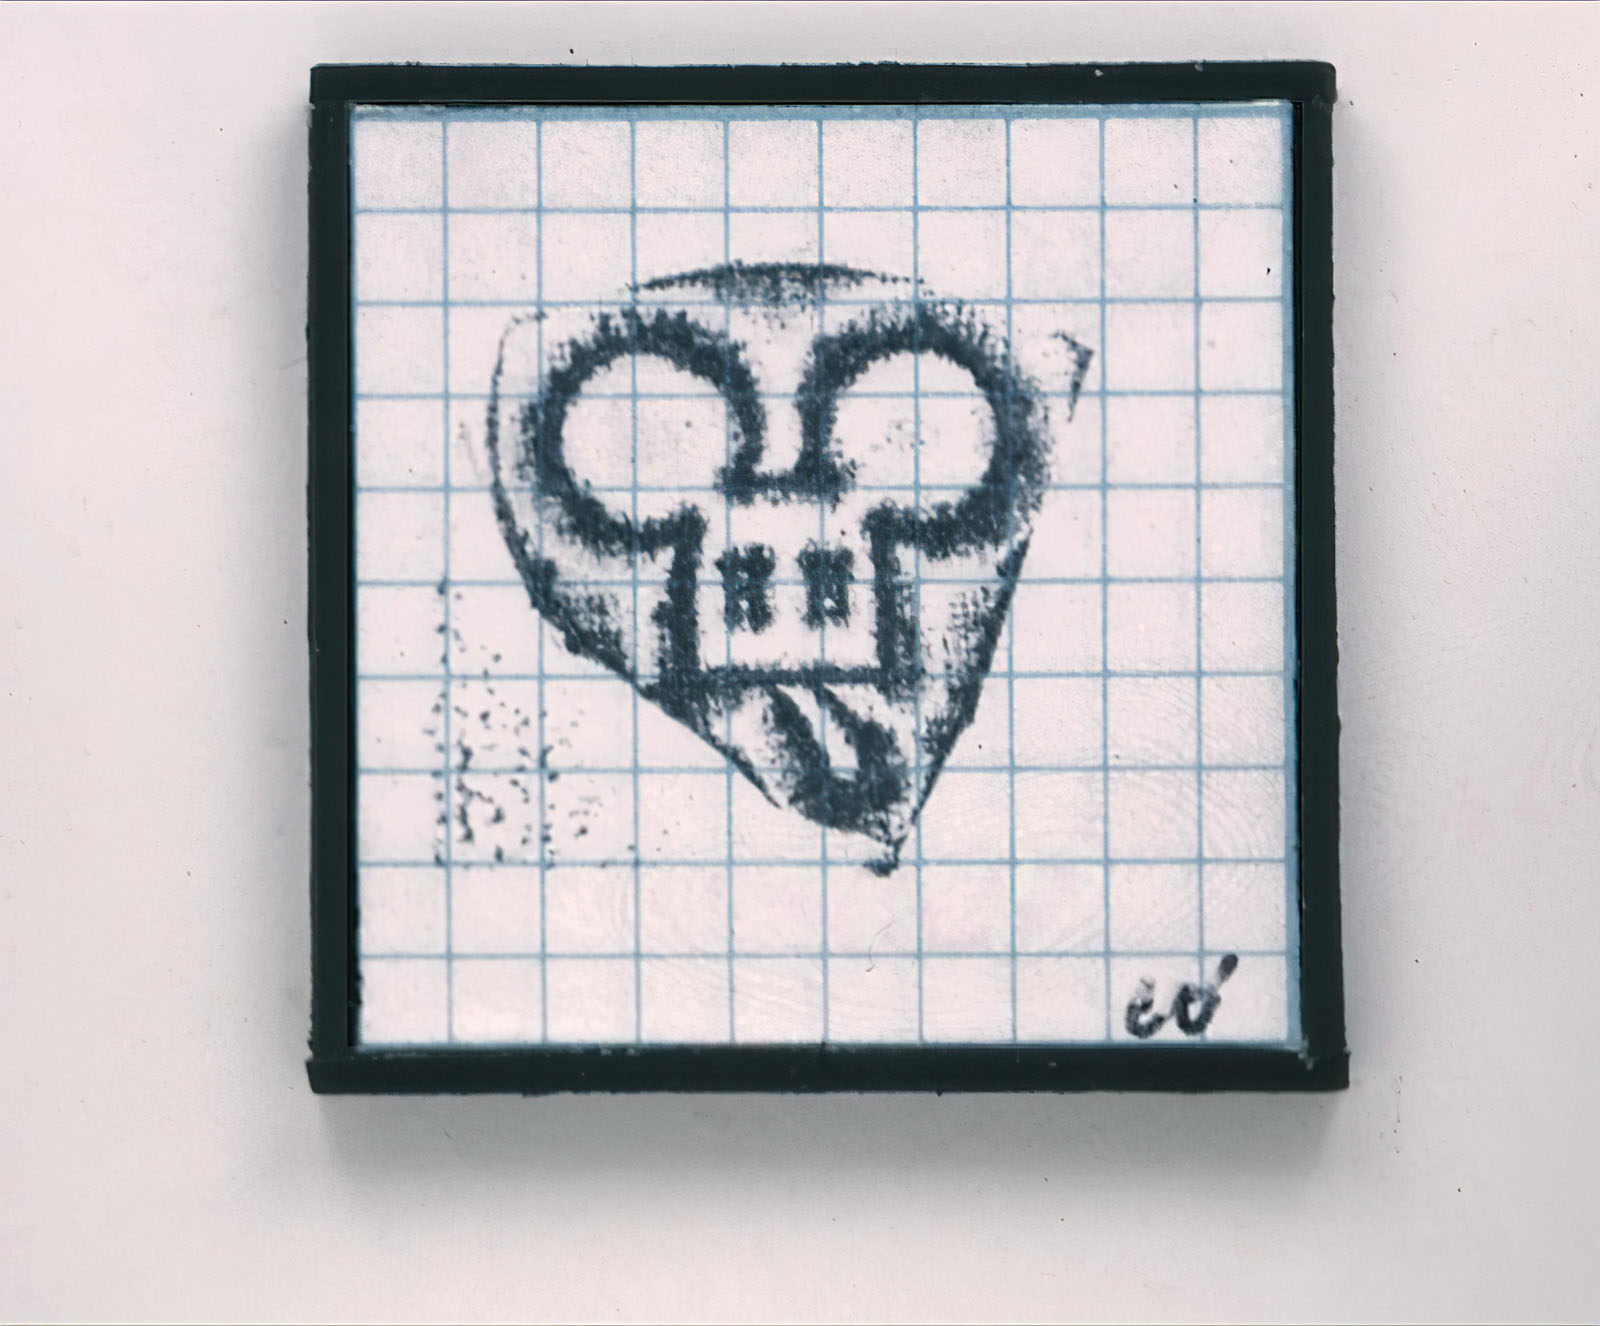 Claes Oldenburg - Geometric Mouse